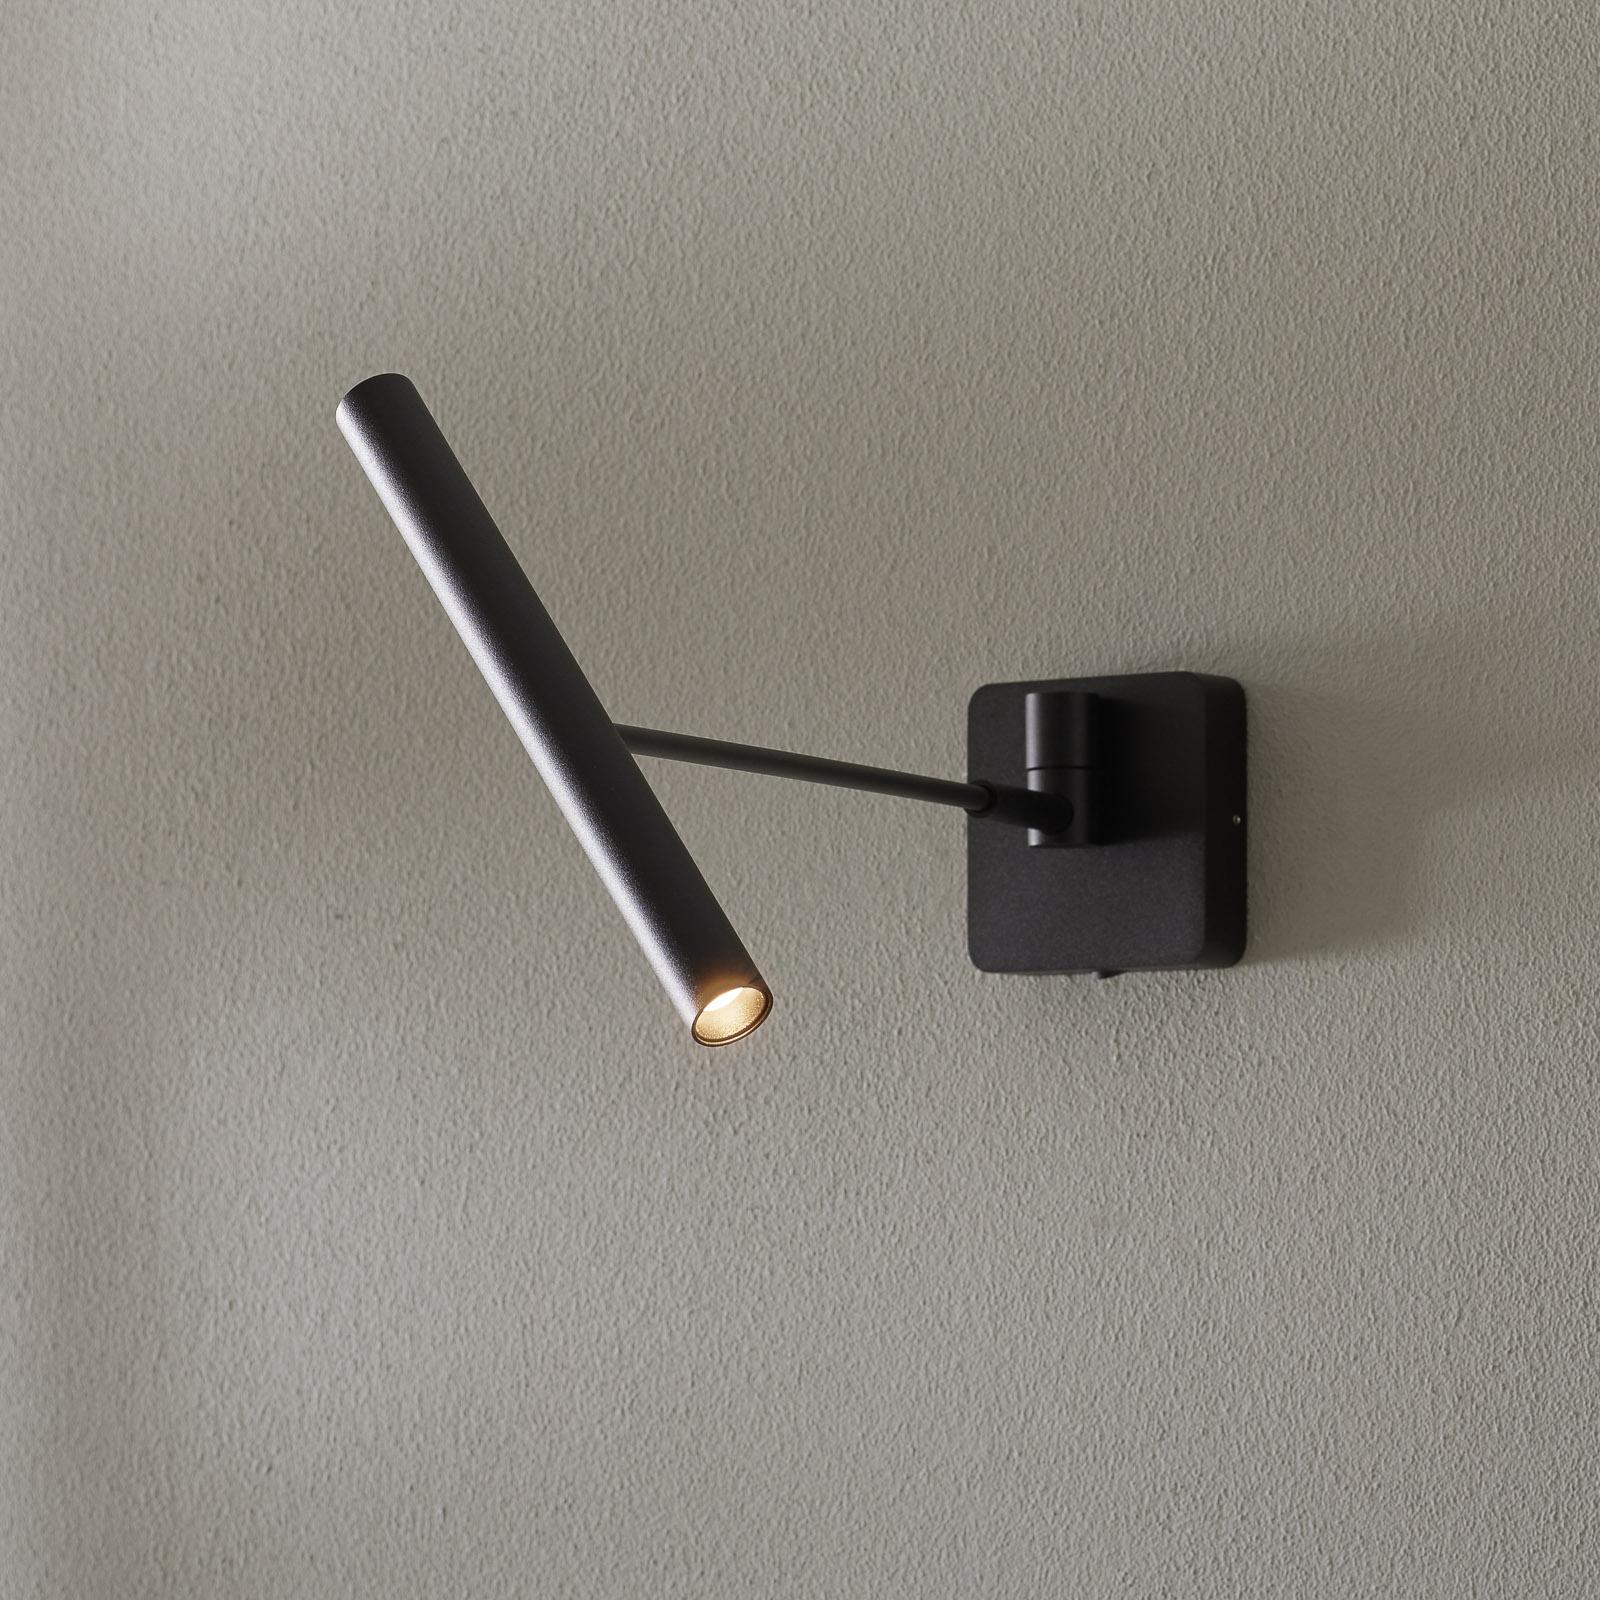 LED wandlamp Wygo dimbaar, kantelbaar, zwart